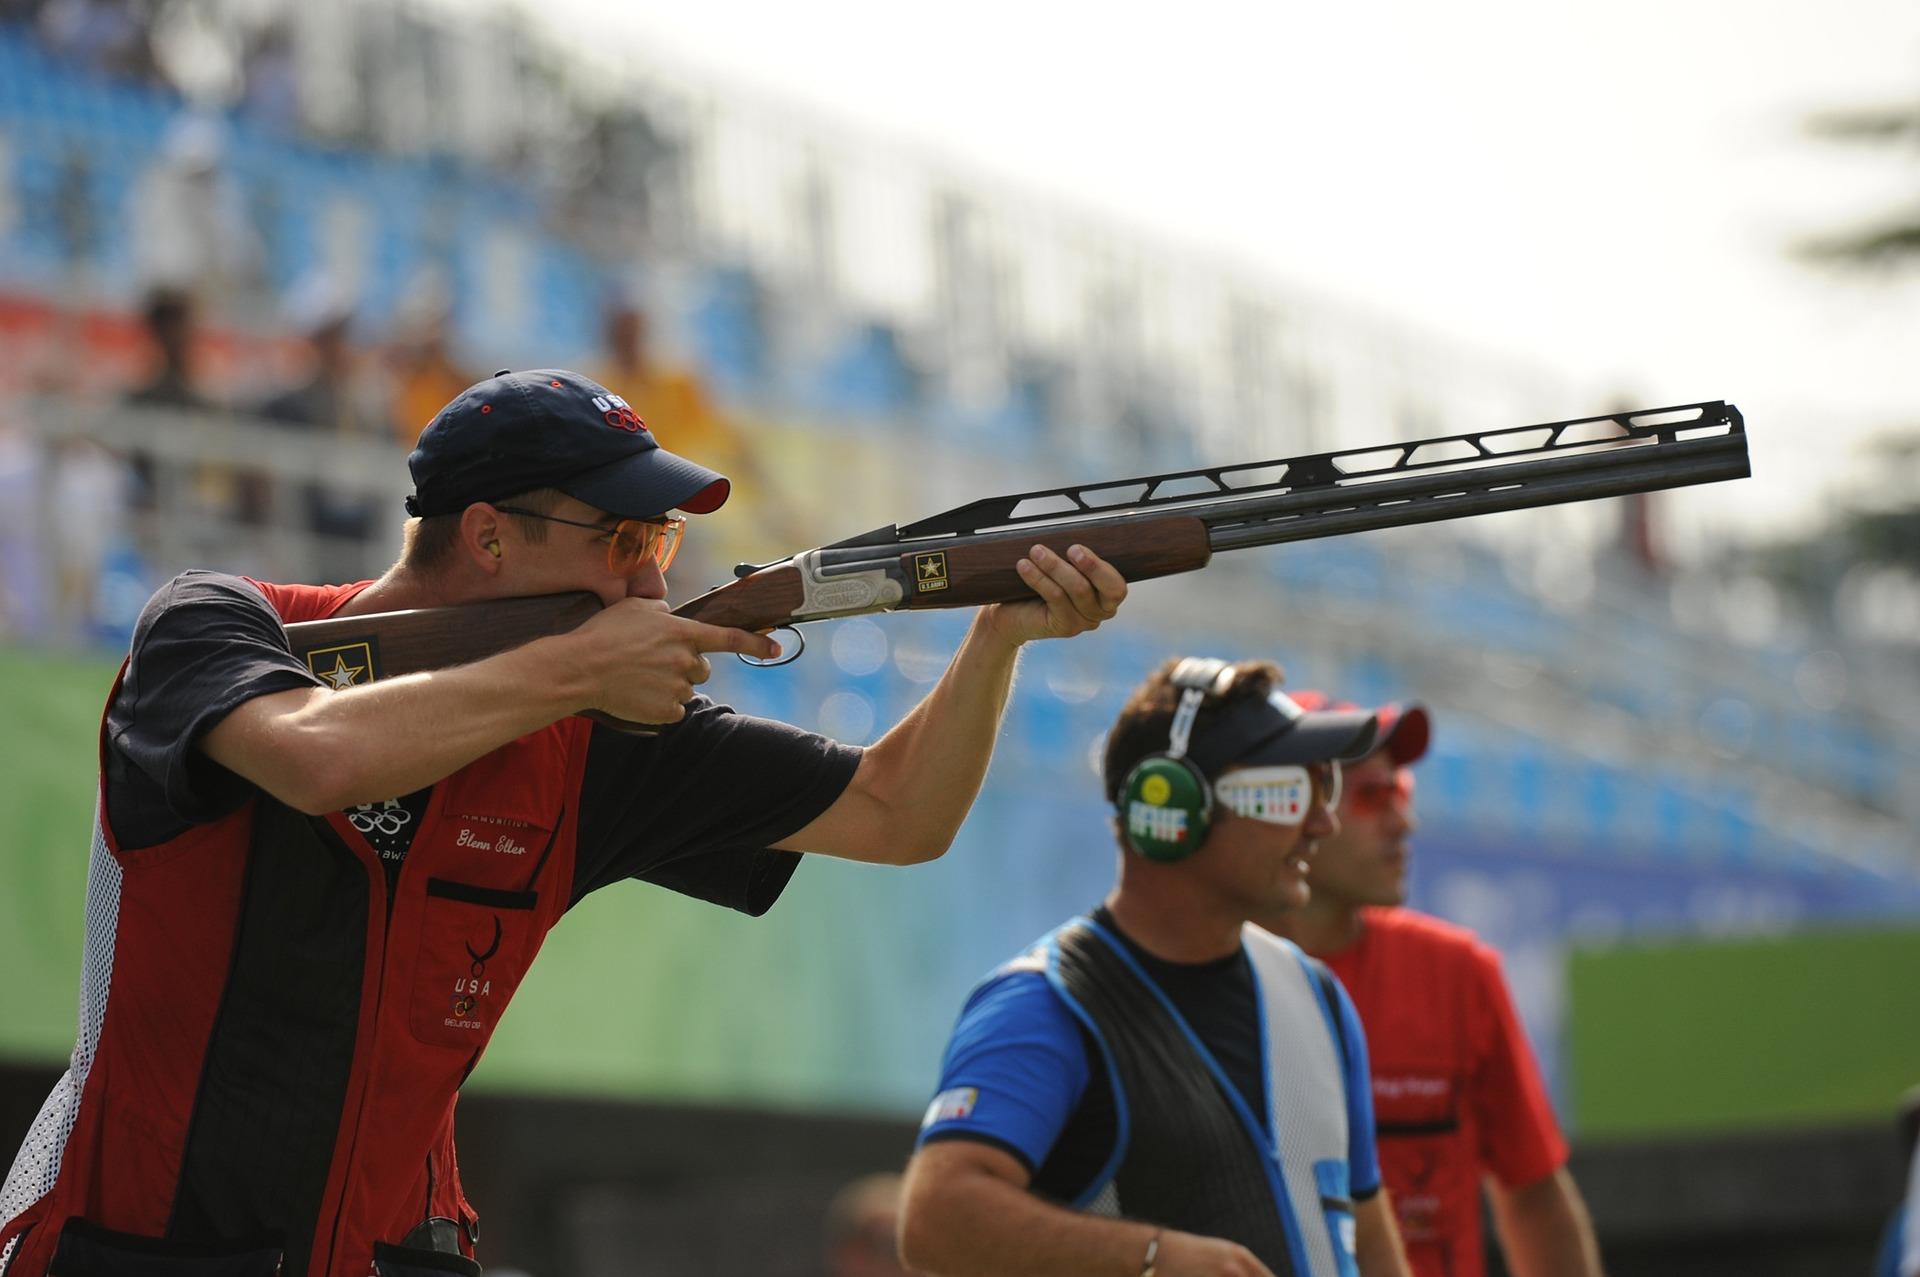 El tiro deportivo como deporte olímpico